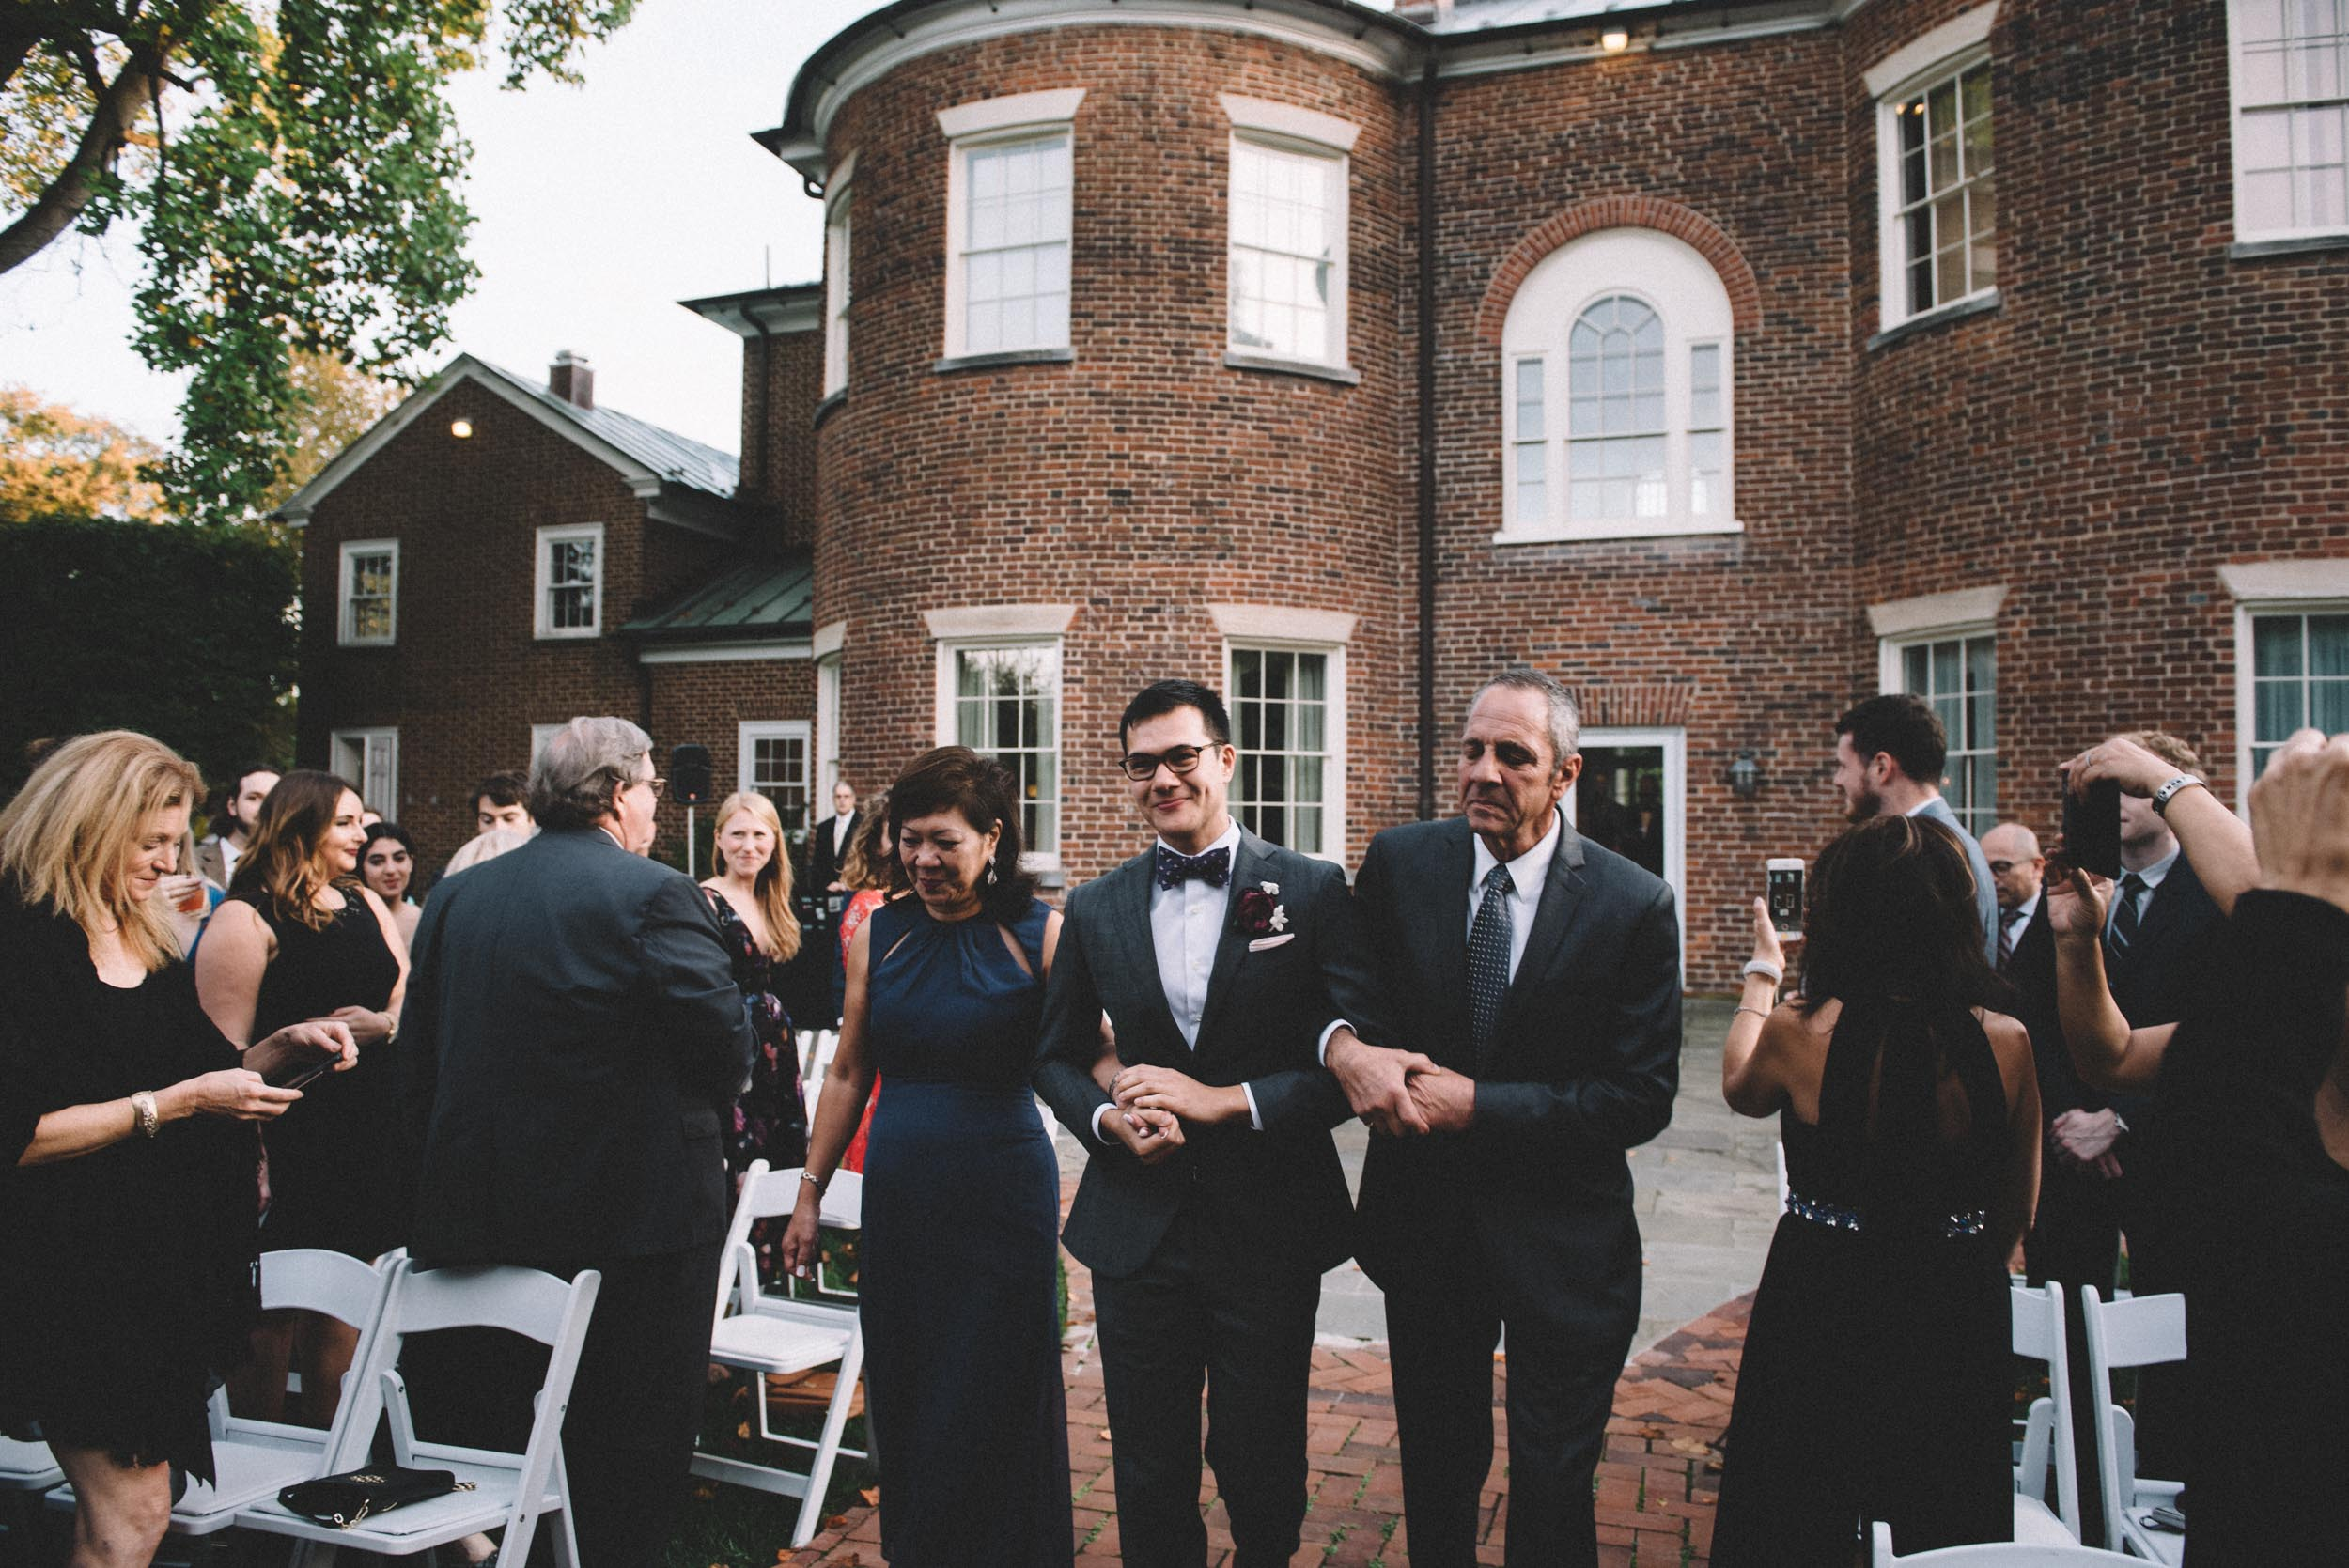 Dumbarton-House-wedding-34.jpg